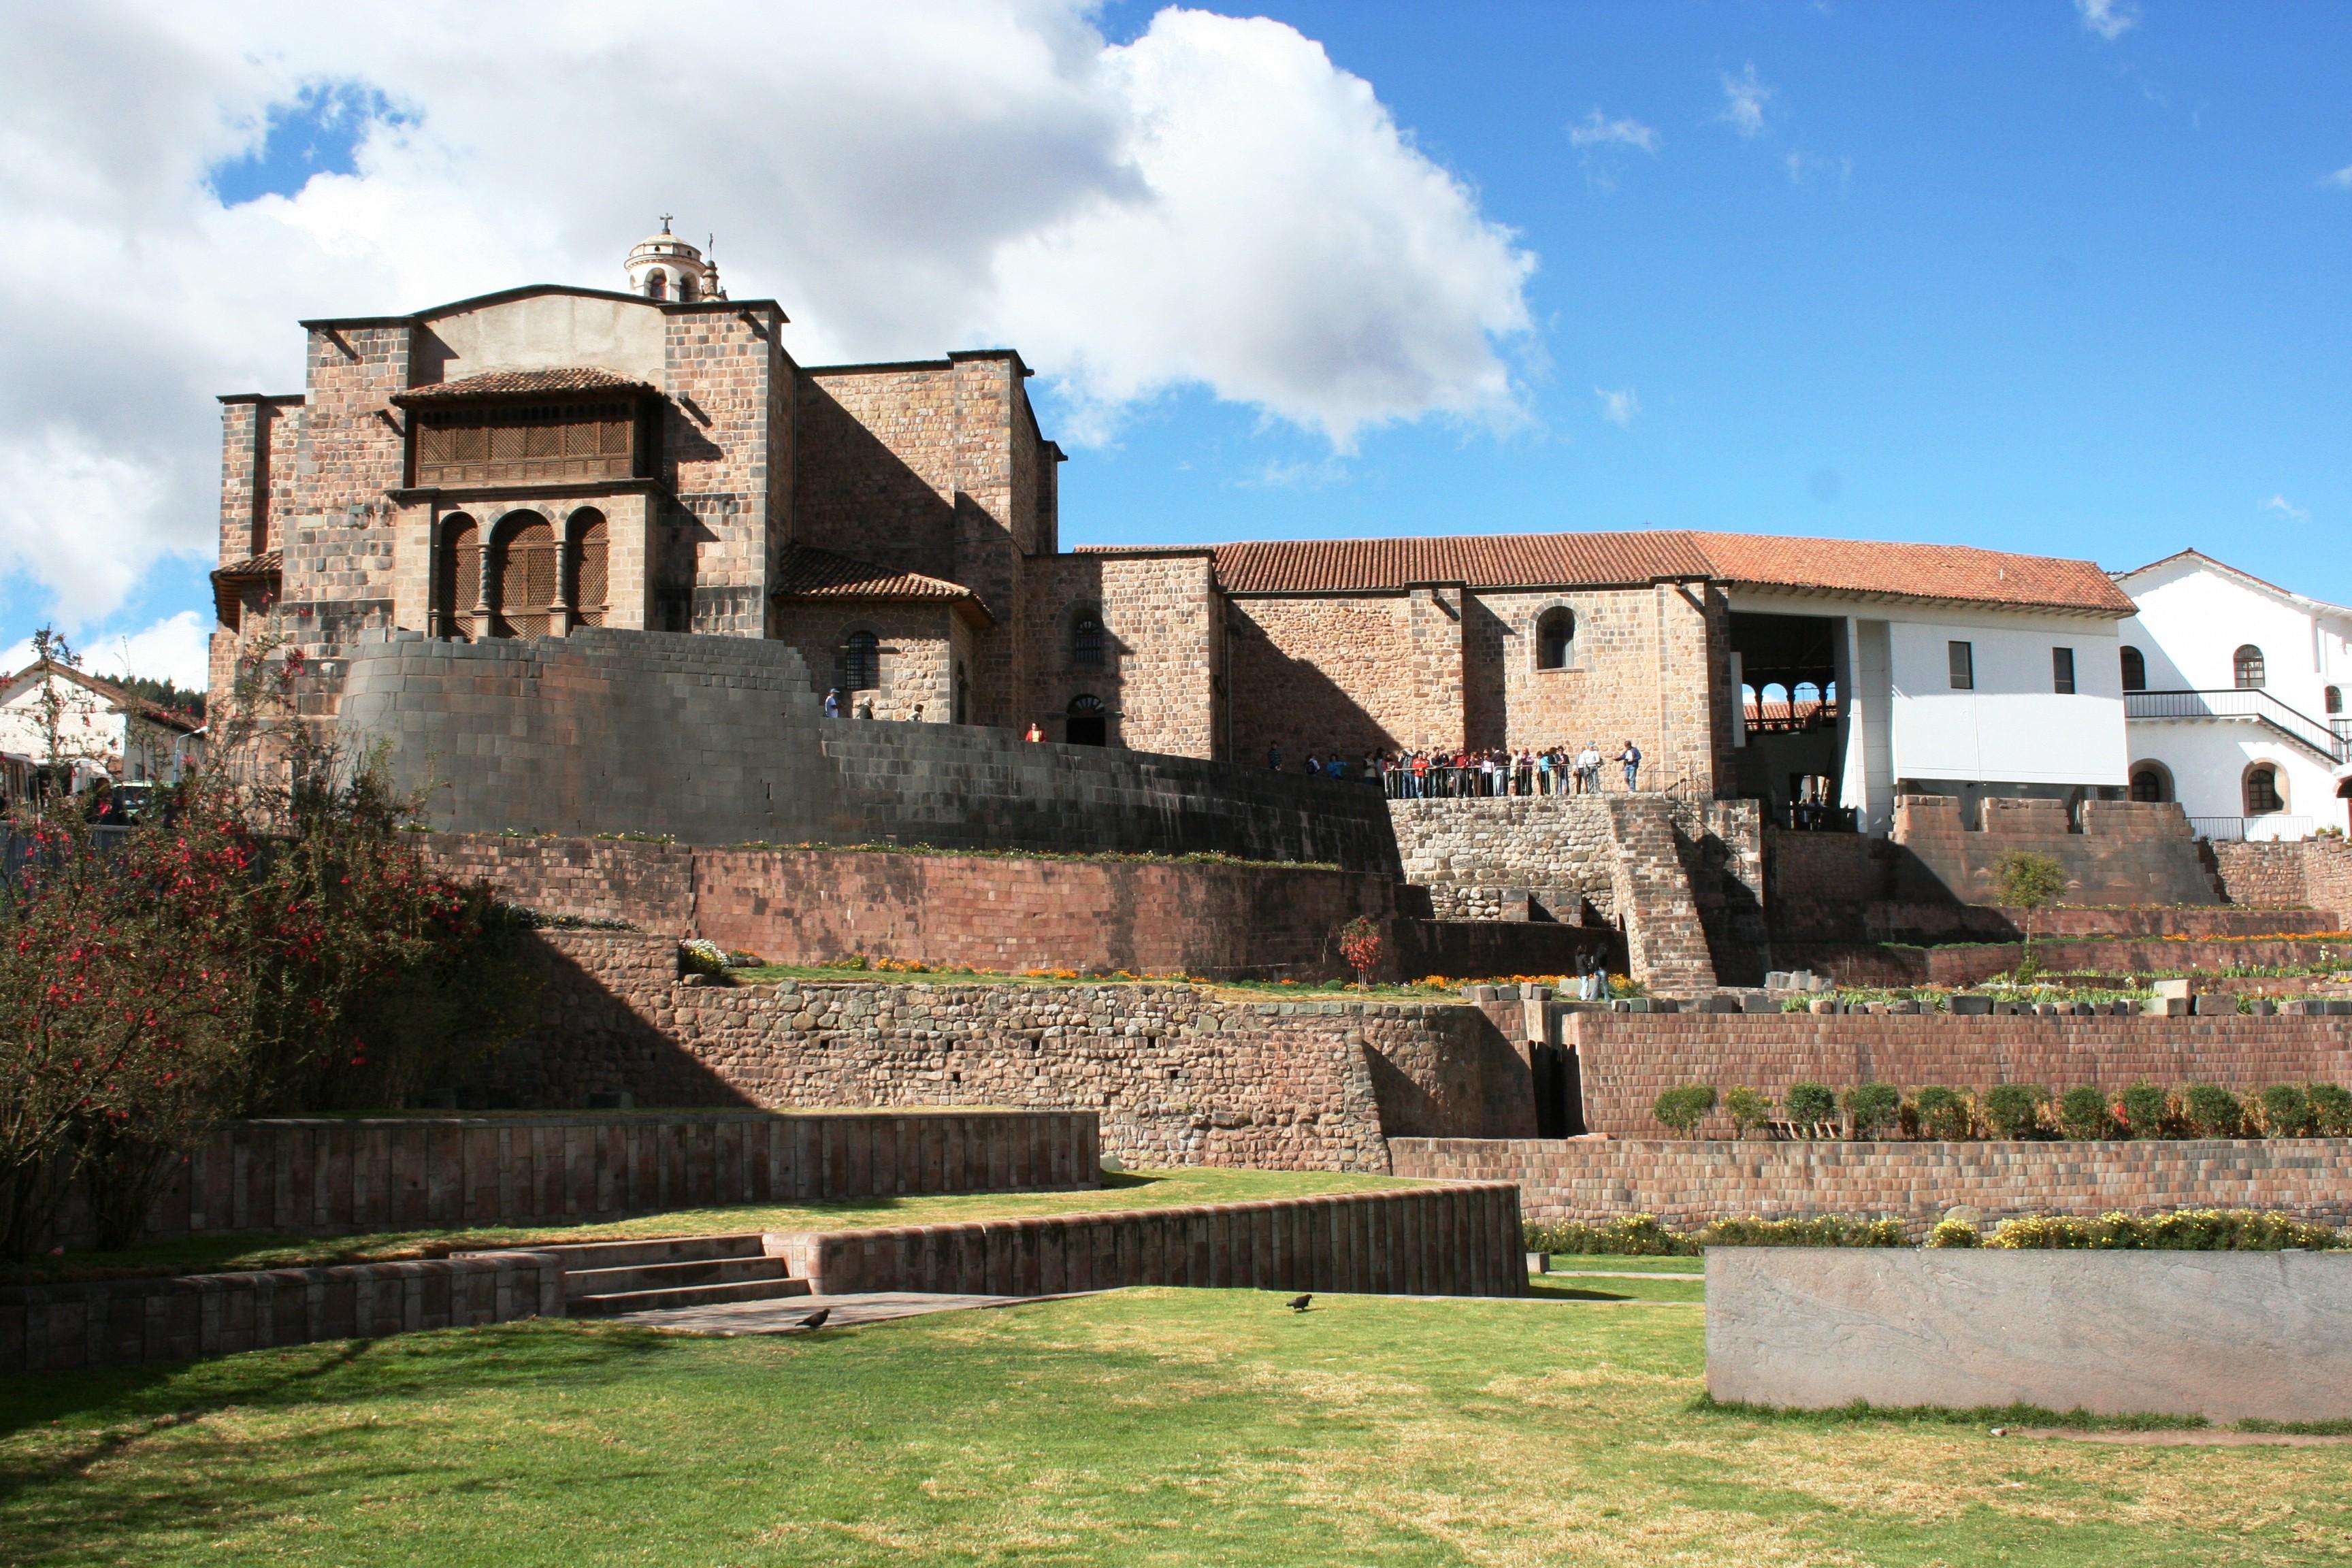 Coricancha in Cuzco